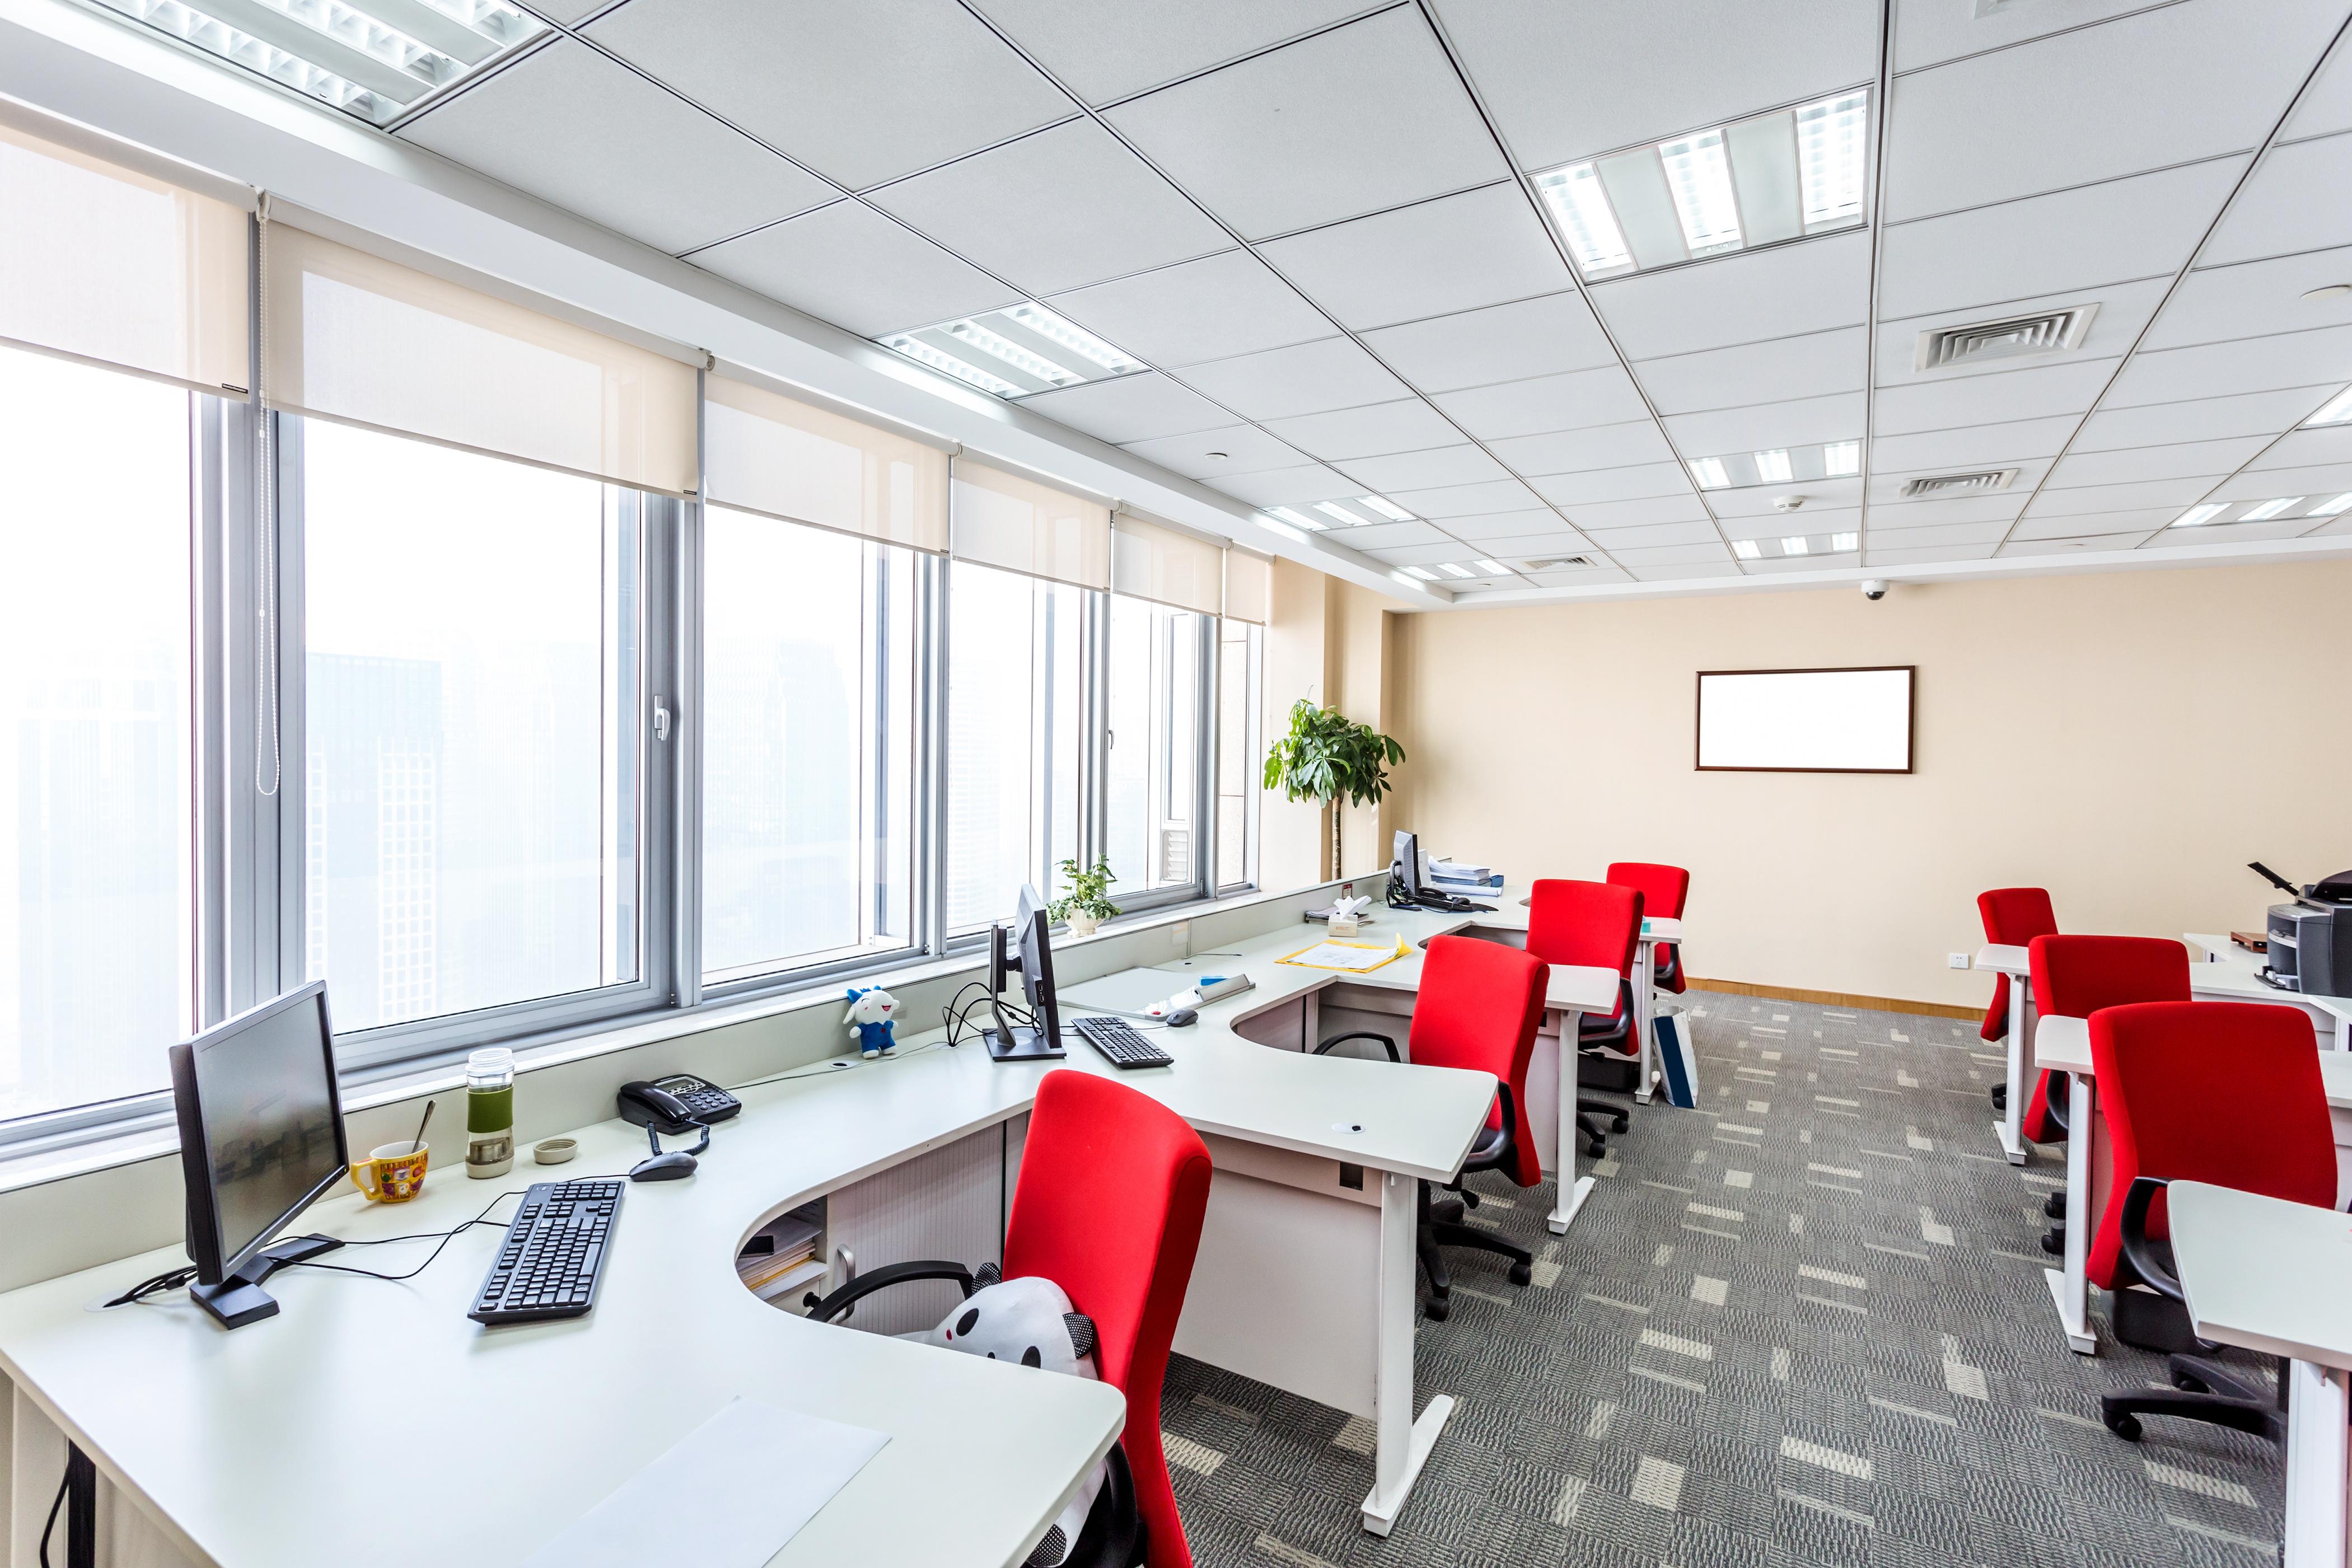 office_modern_office_image_4201